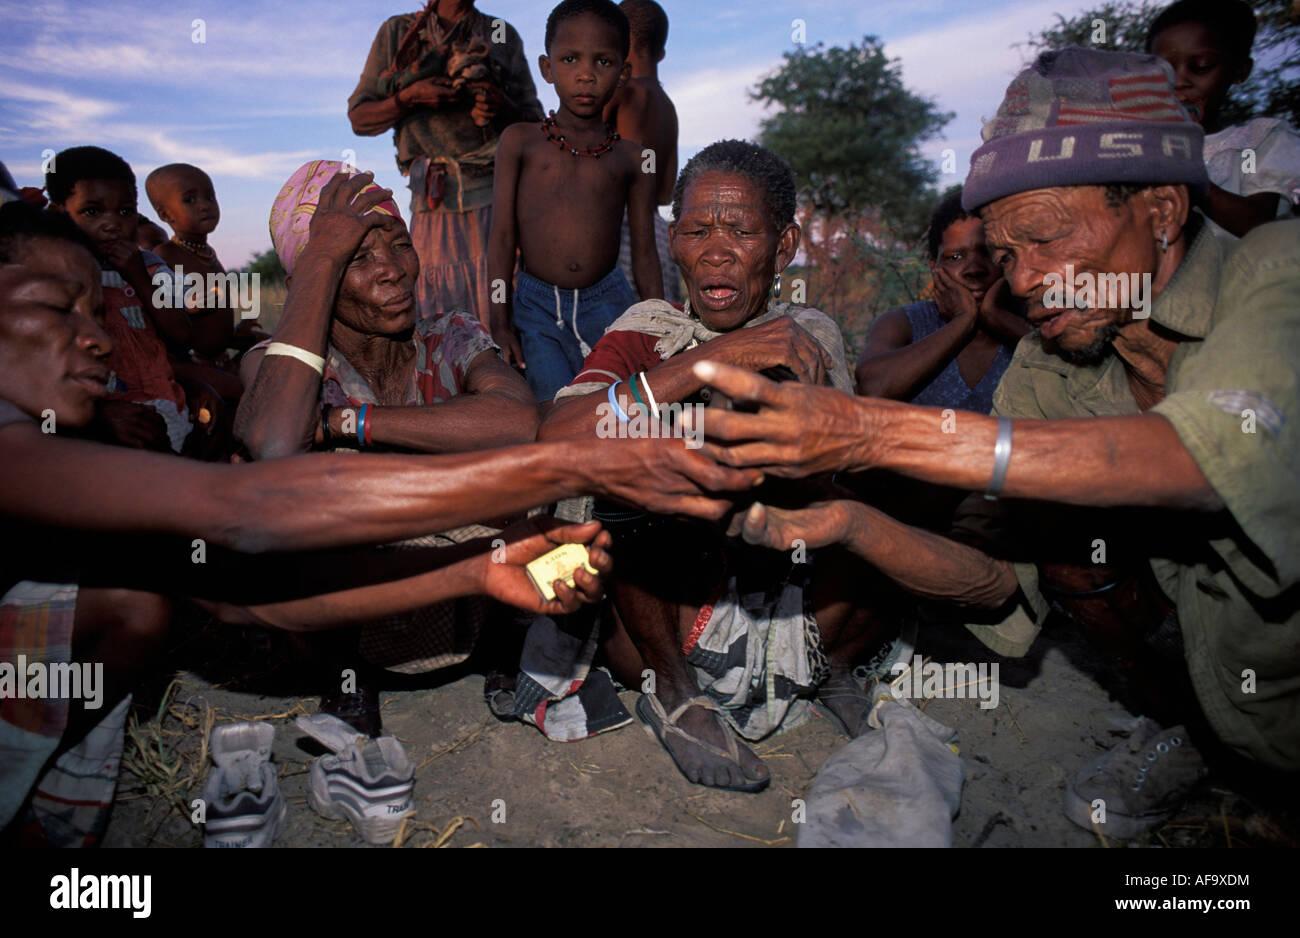 Old Kua bushman people smoking pipe, Molapo, Central Kalahari Game Reserve; Botswana - Stock Image